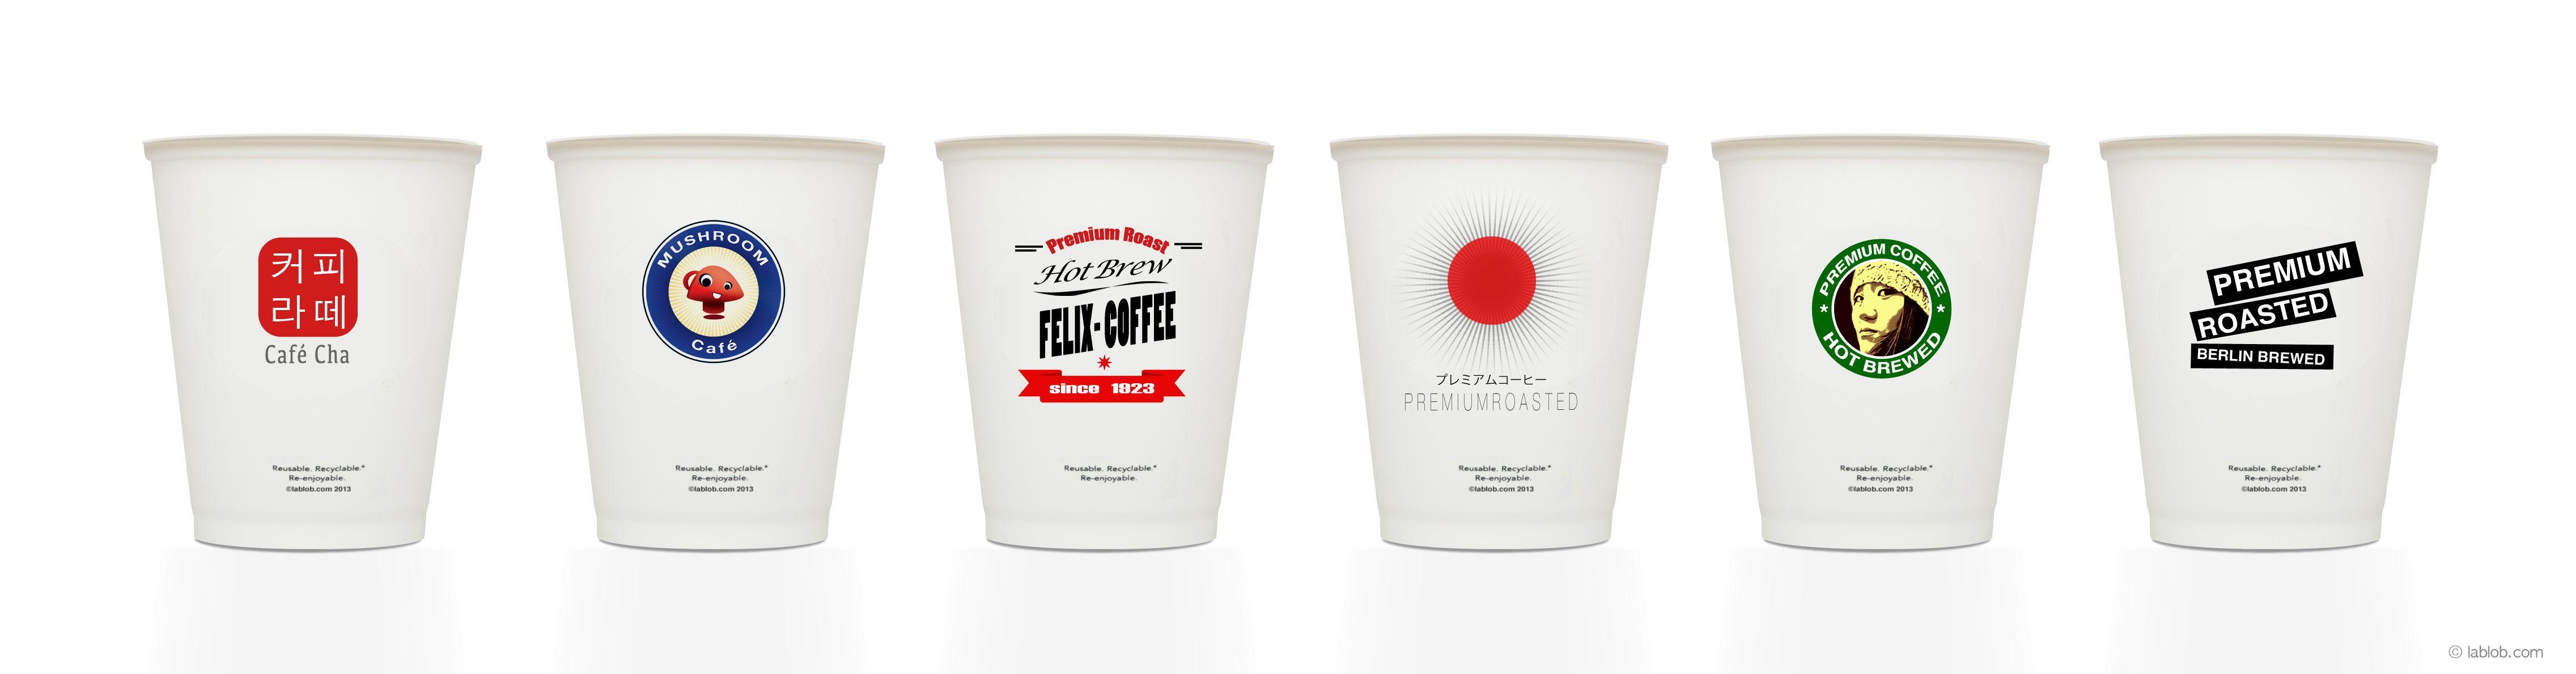 Coffee Logos by Coffee logo, Weird food, Coffee